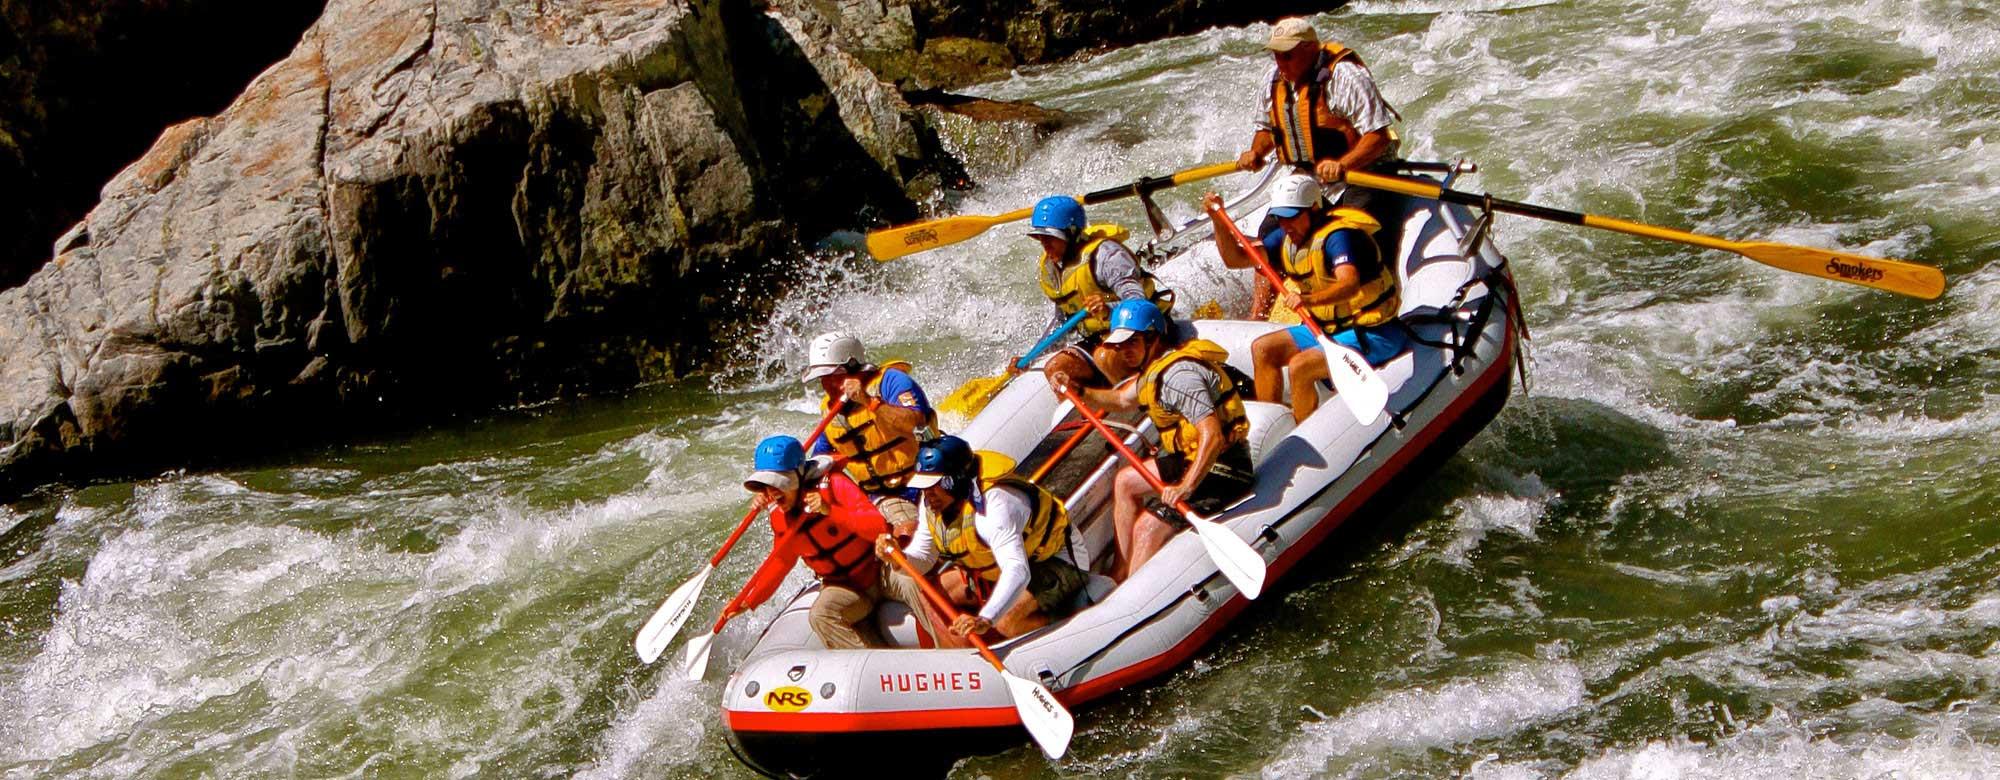 white-water-rafting-in-idaho